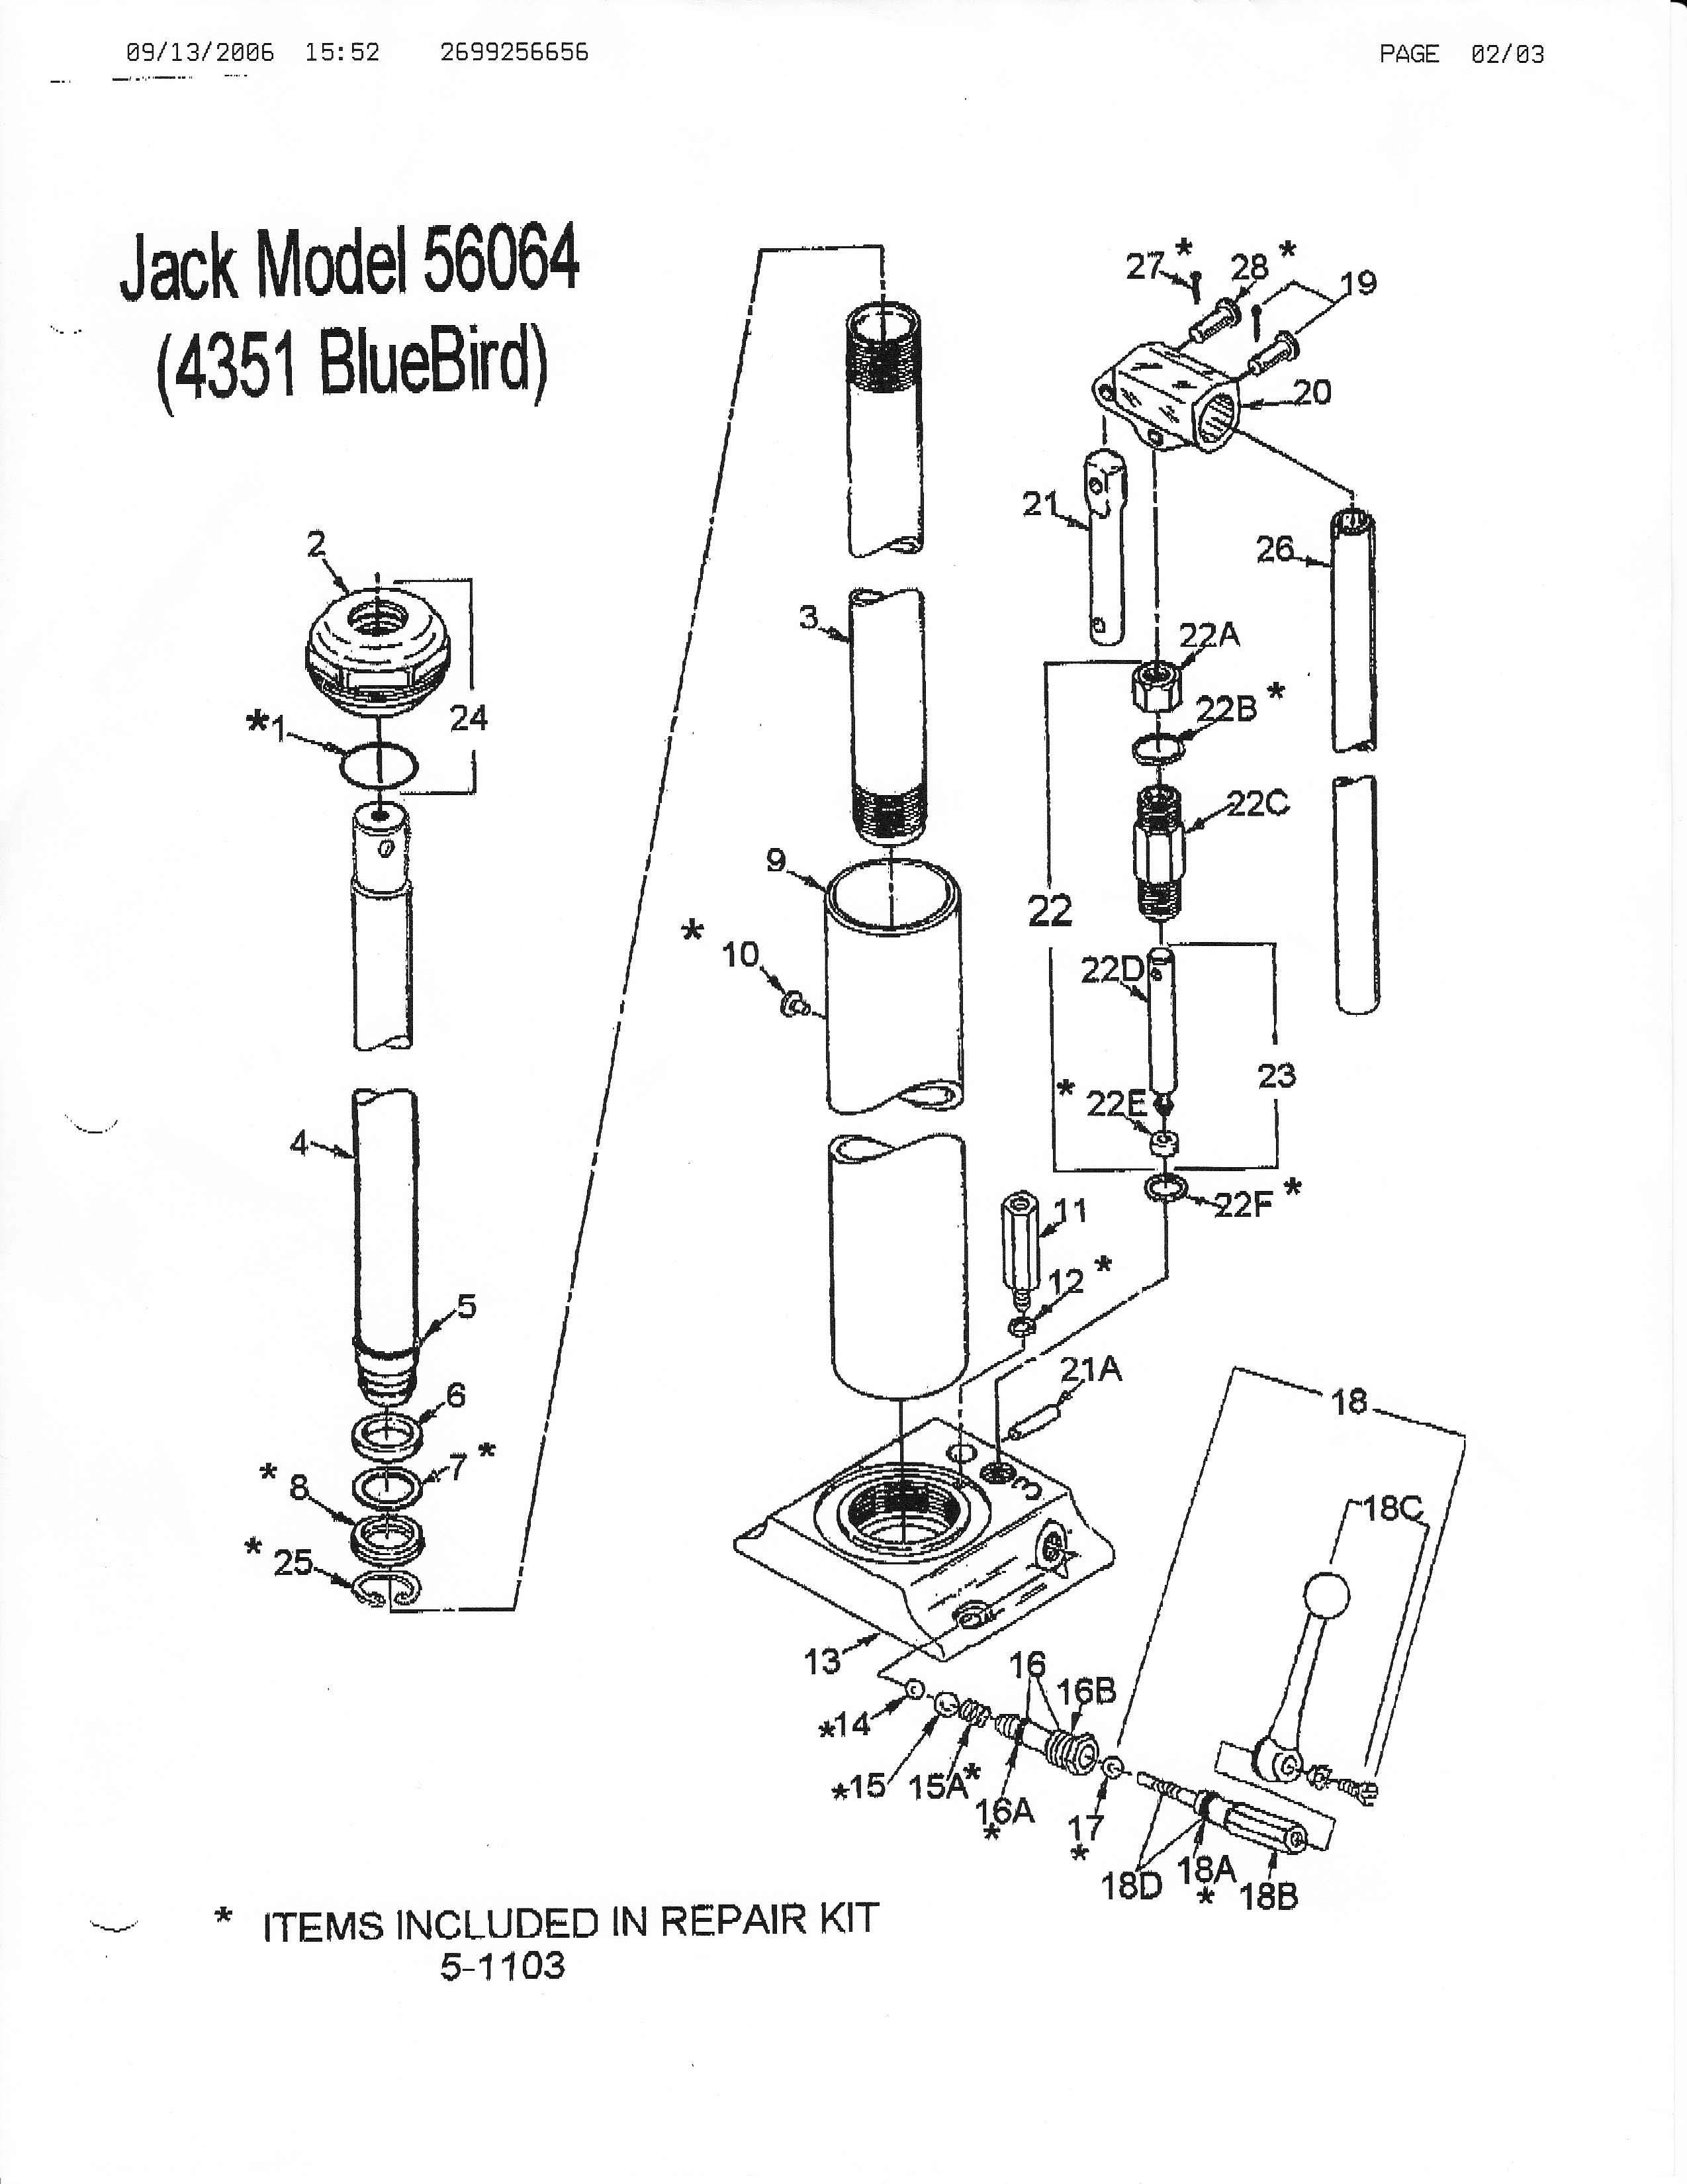 blackhawk floor jack parts diagram 2004 ford explorer xlt radio wiring lincoln free engine image for